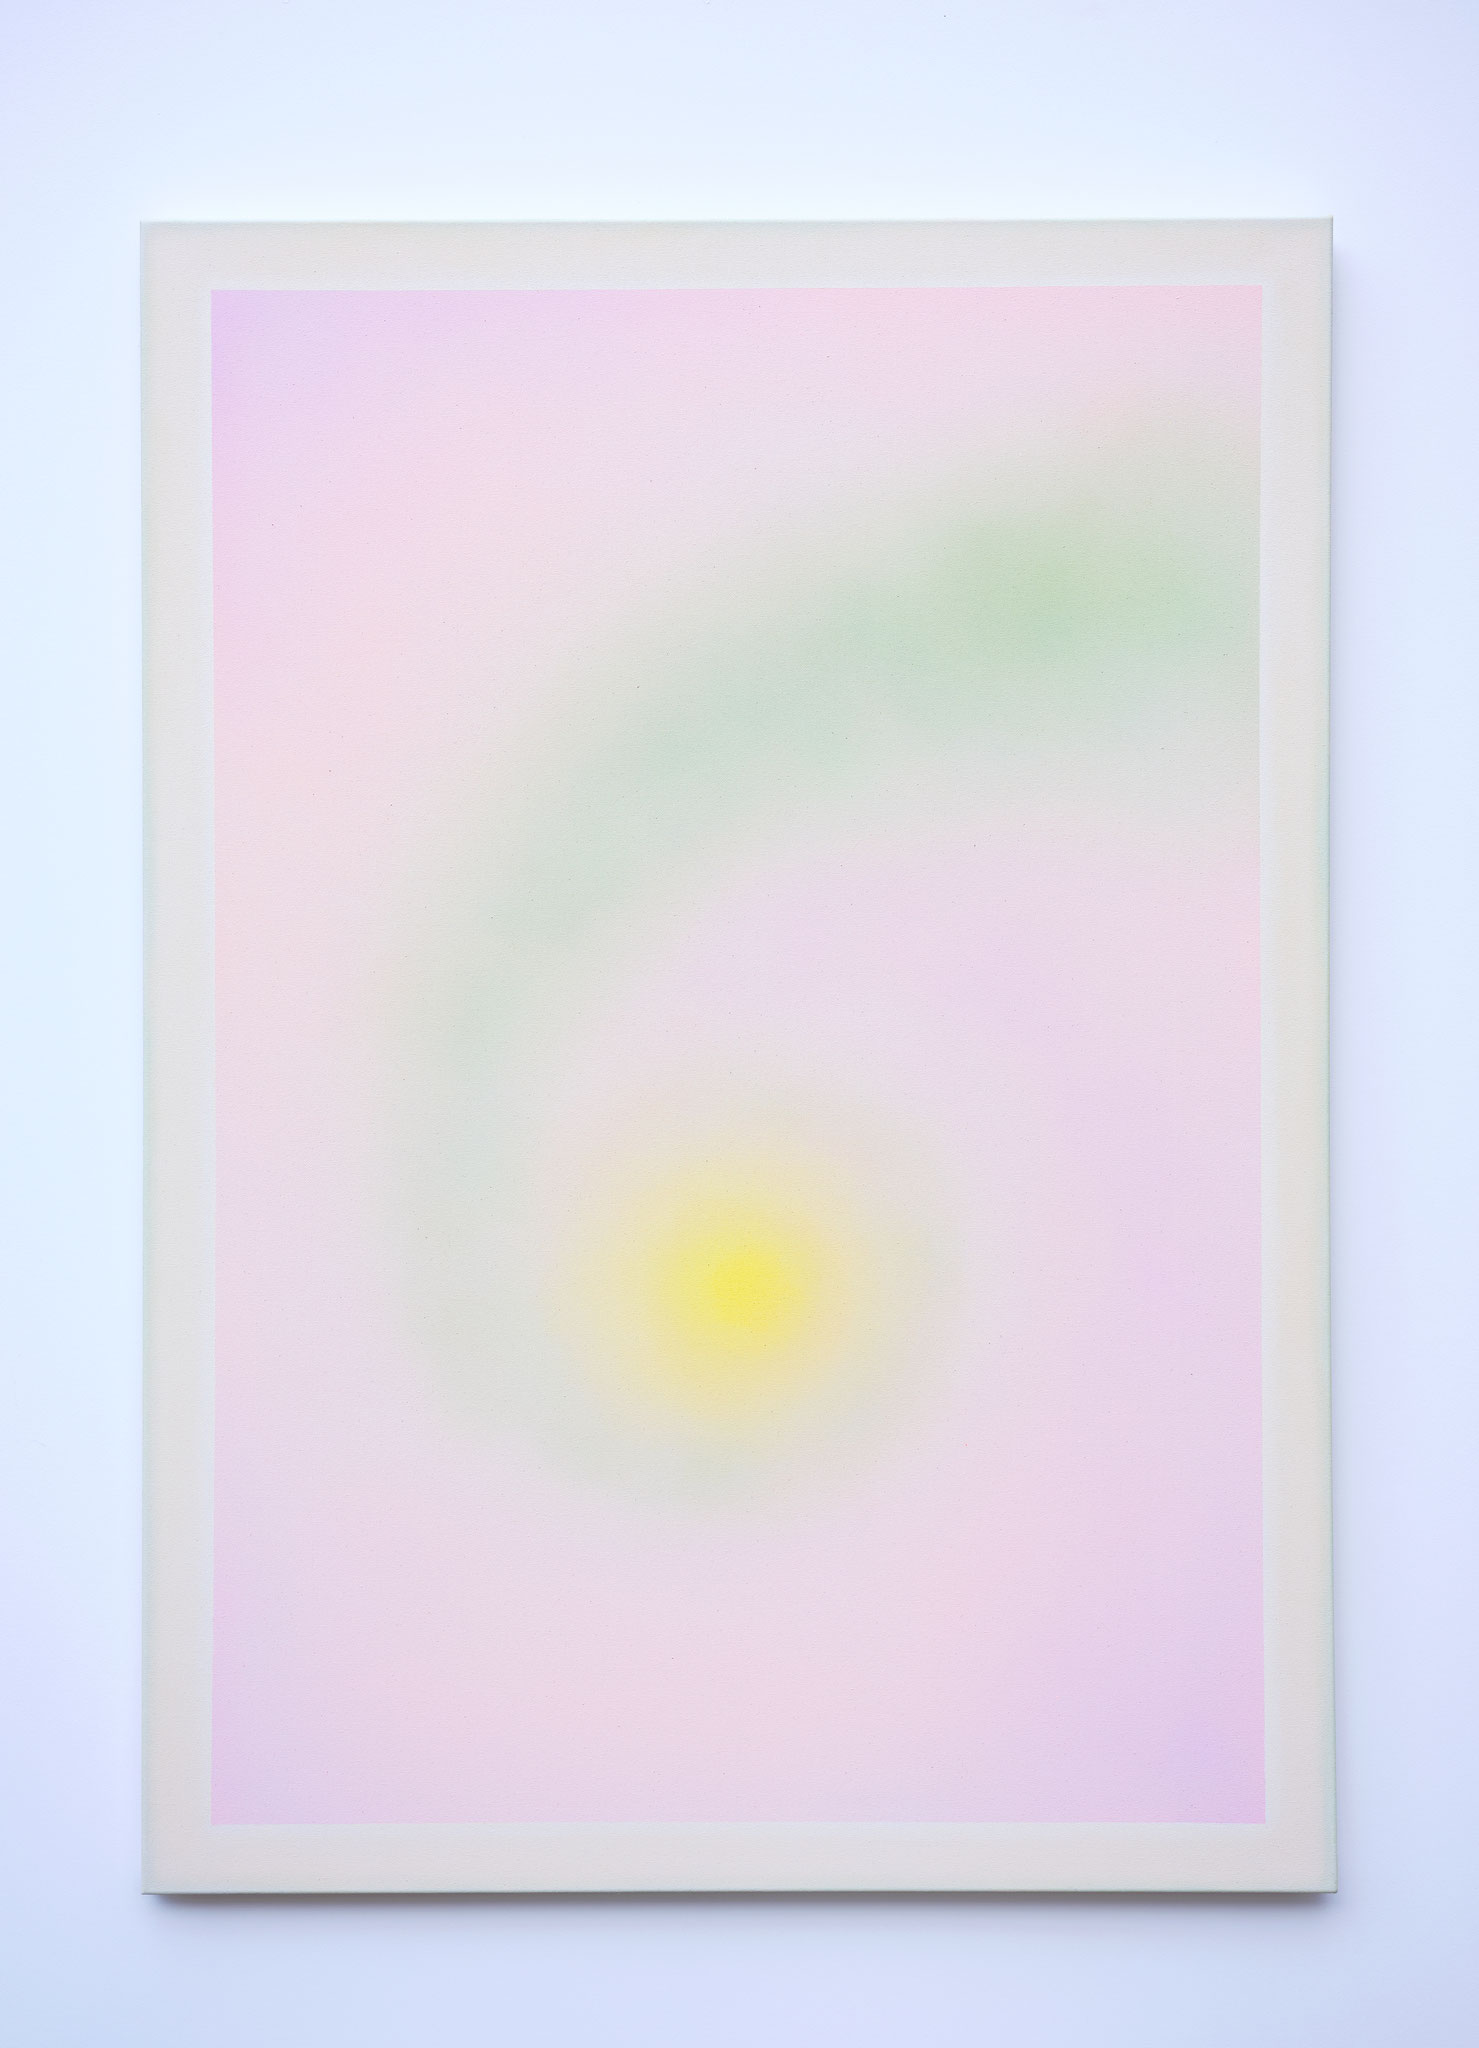 "Alina Birkner ""Untitled (Singing myself into being)"" 2019, 170x120 cm, Acrylic on Canvas"